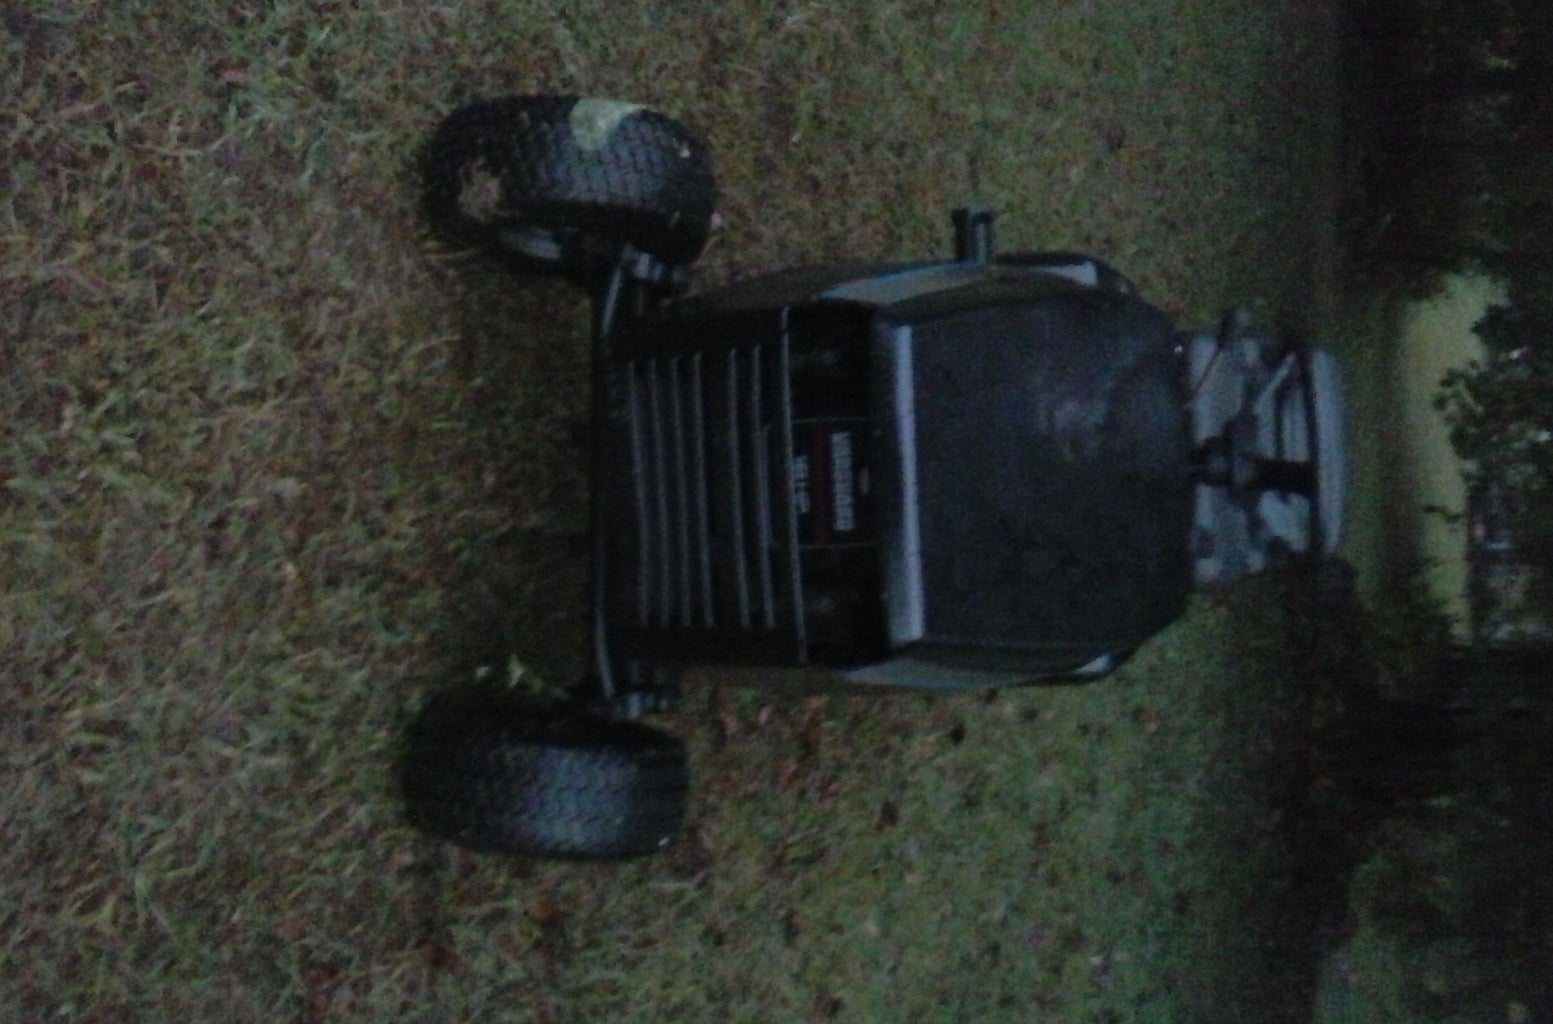 Mow-Kart 2